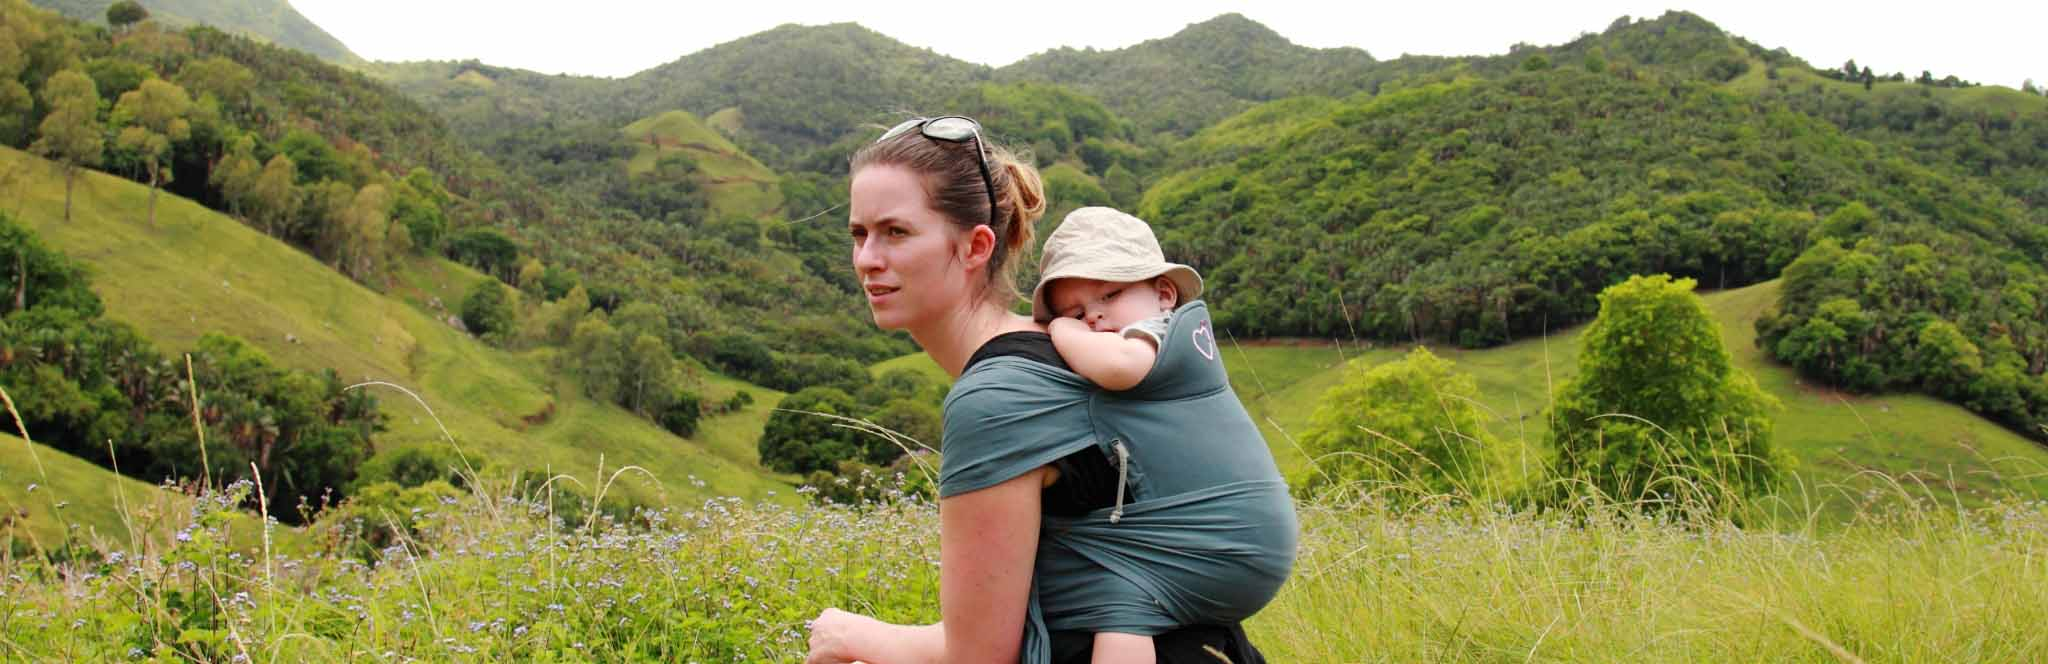 porte-bébé meitai physiologique évolutif Mid-Tai LLA